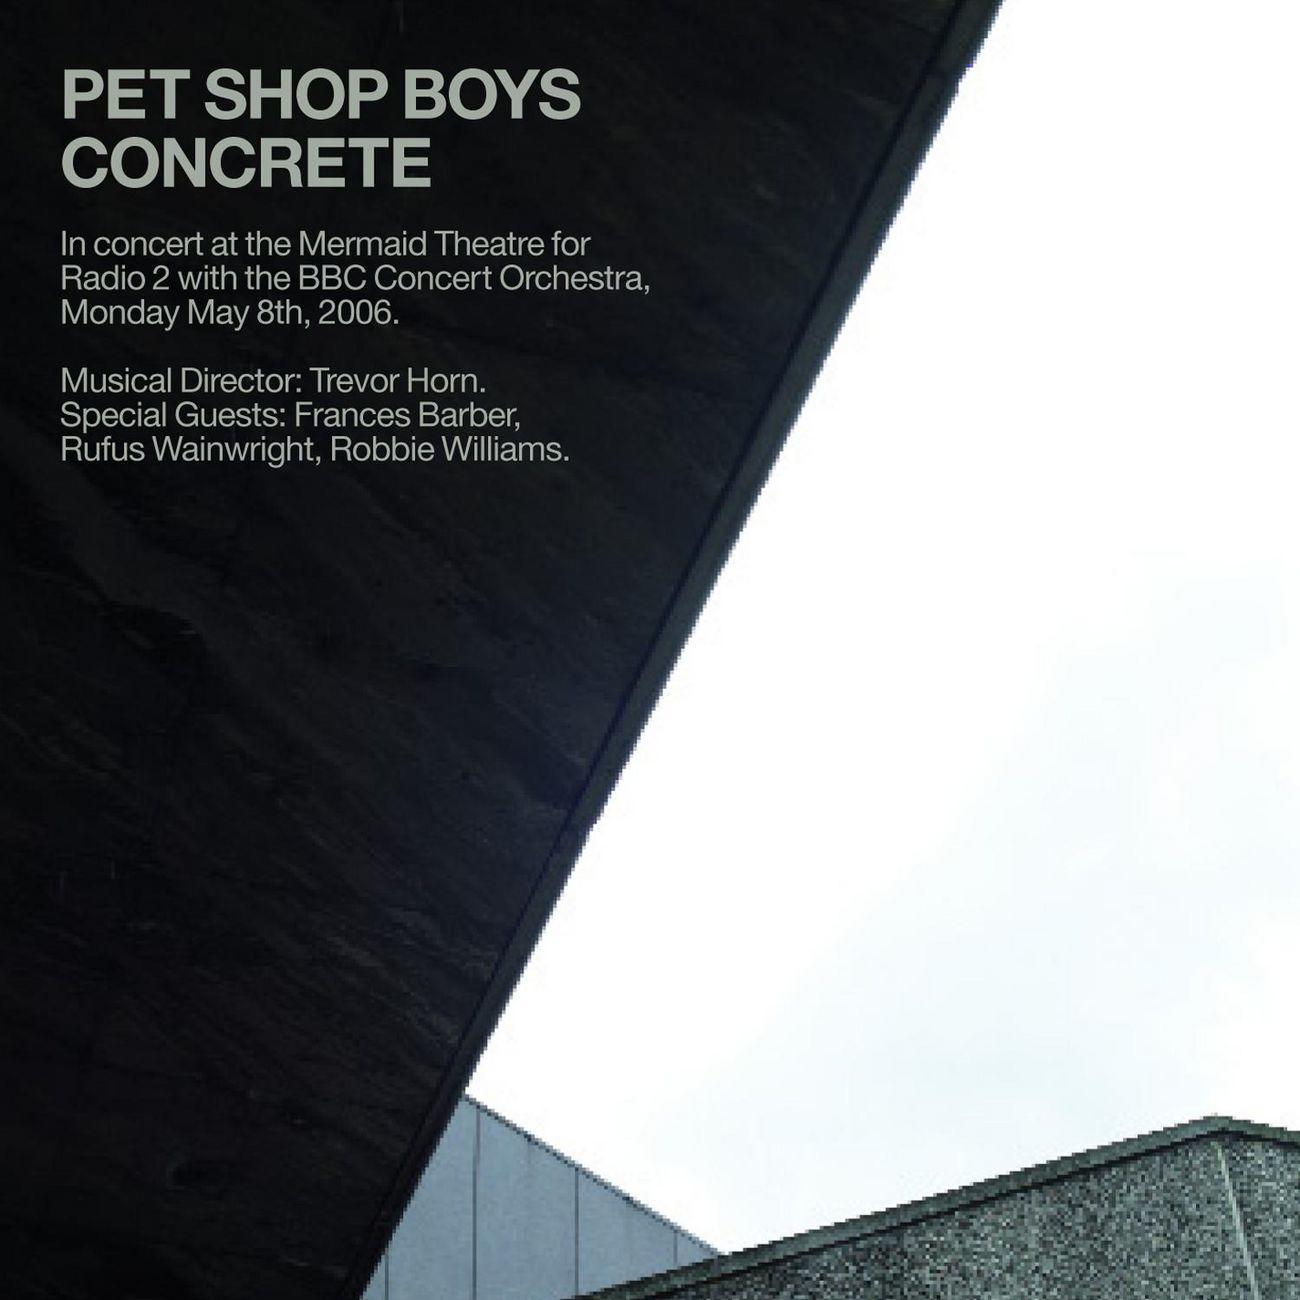 Record collector pet shop boys concrete review - Cd concreet ...